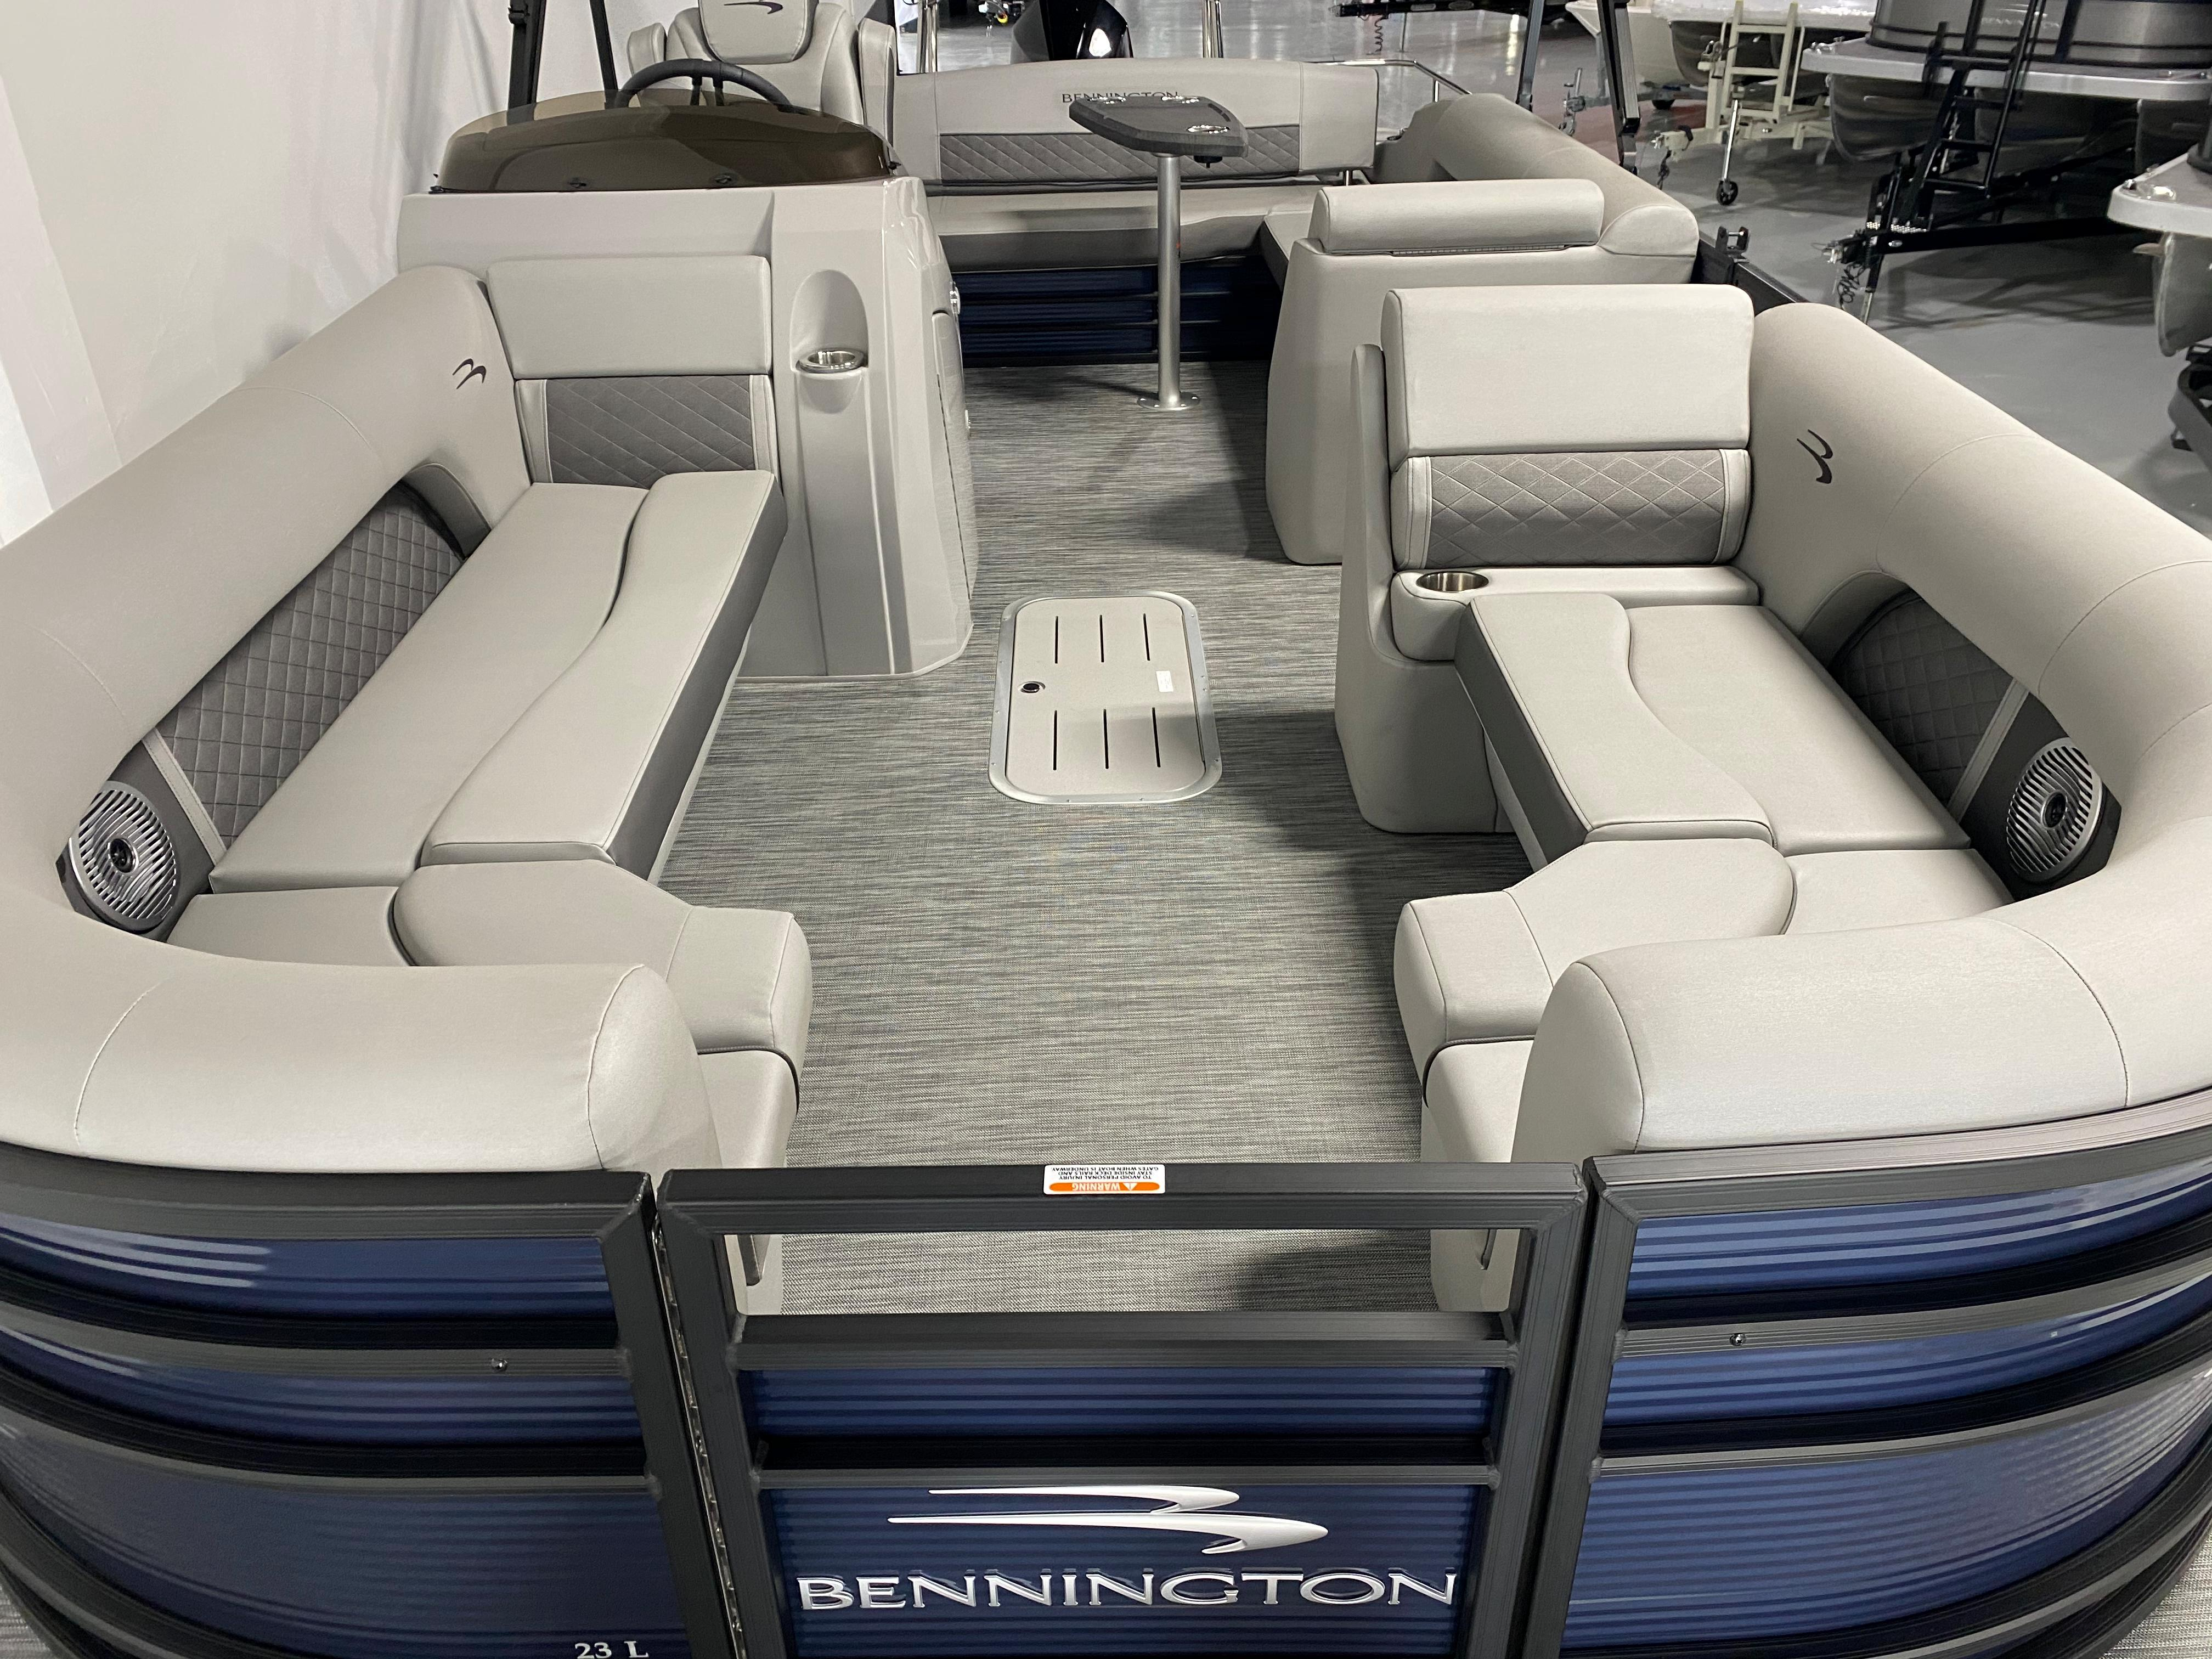 2021 Bennington 23 LSB #B9381H inventory image at Sun Country Inland in Lake Havasu City